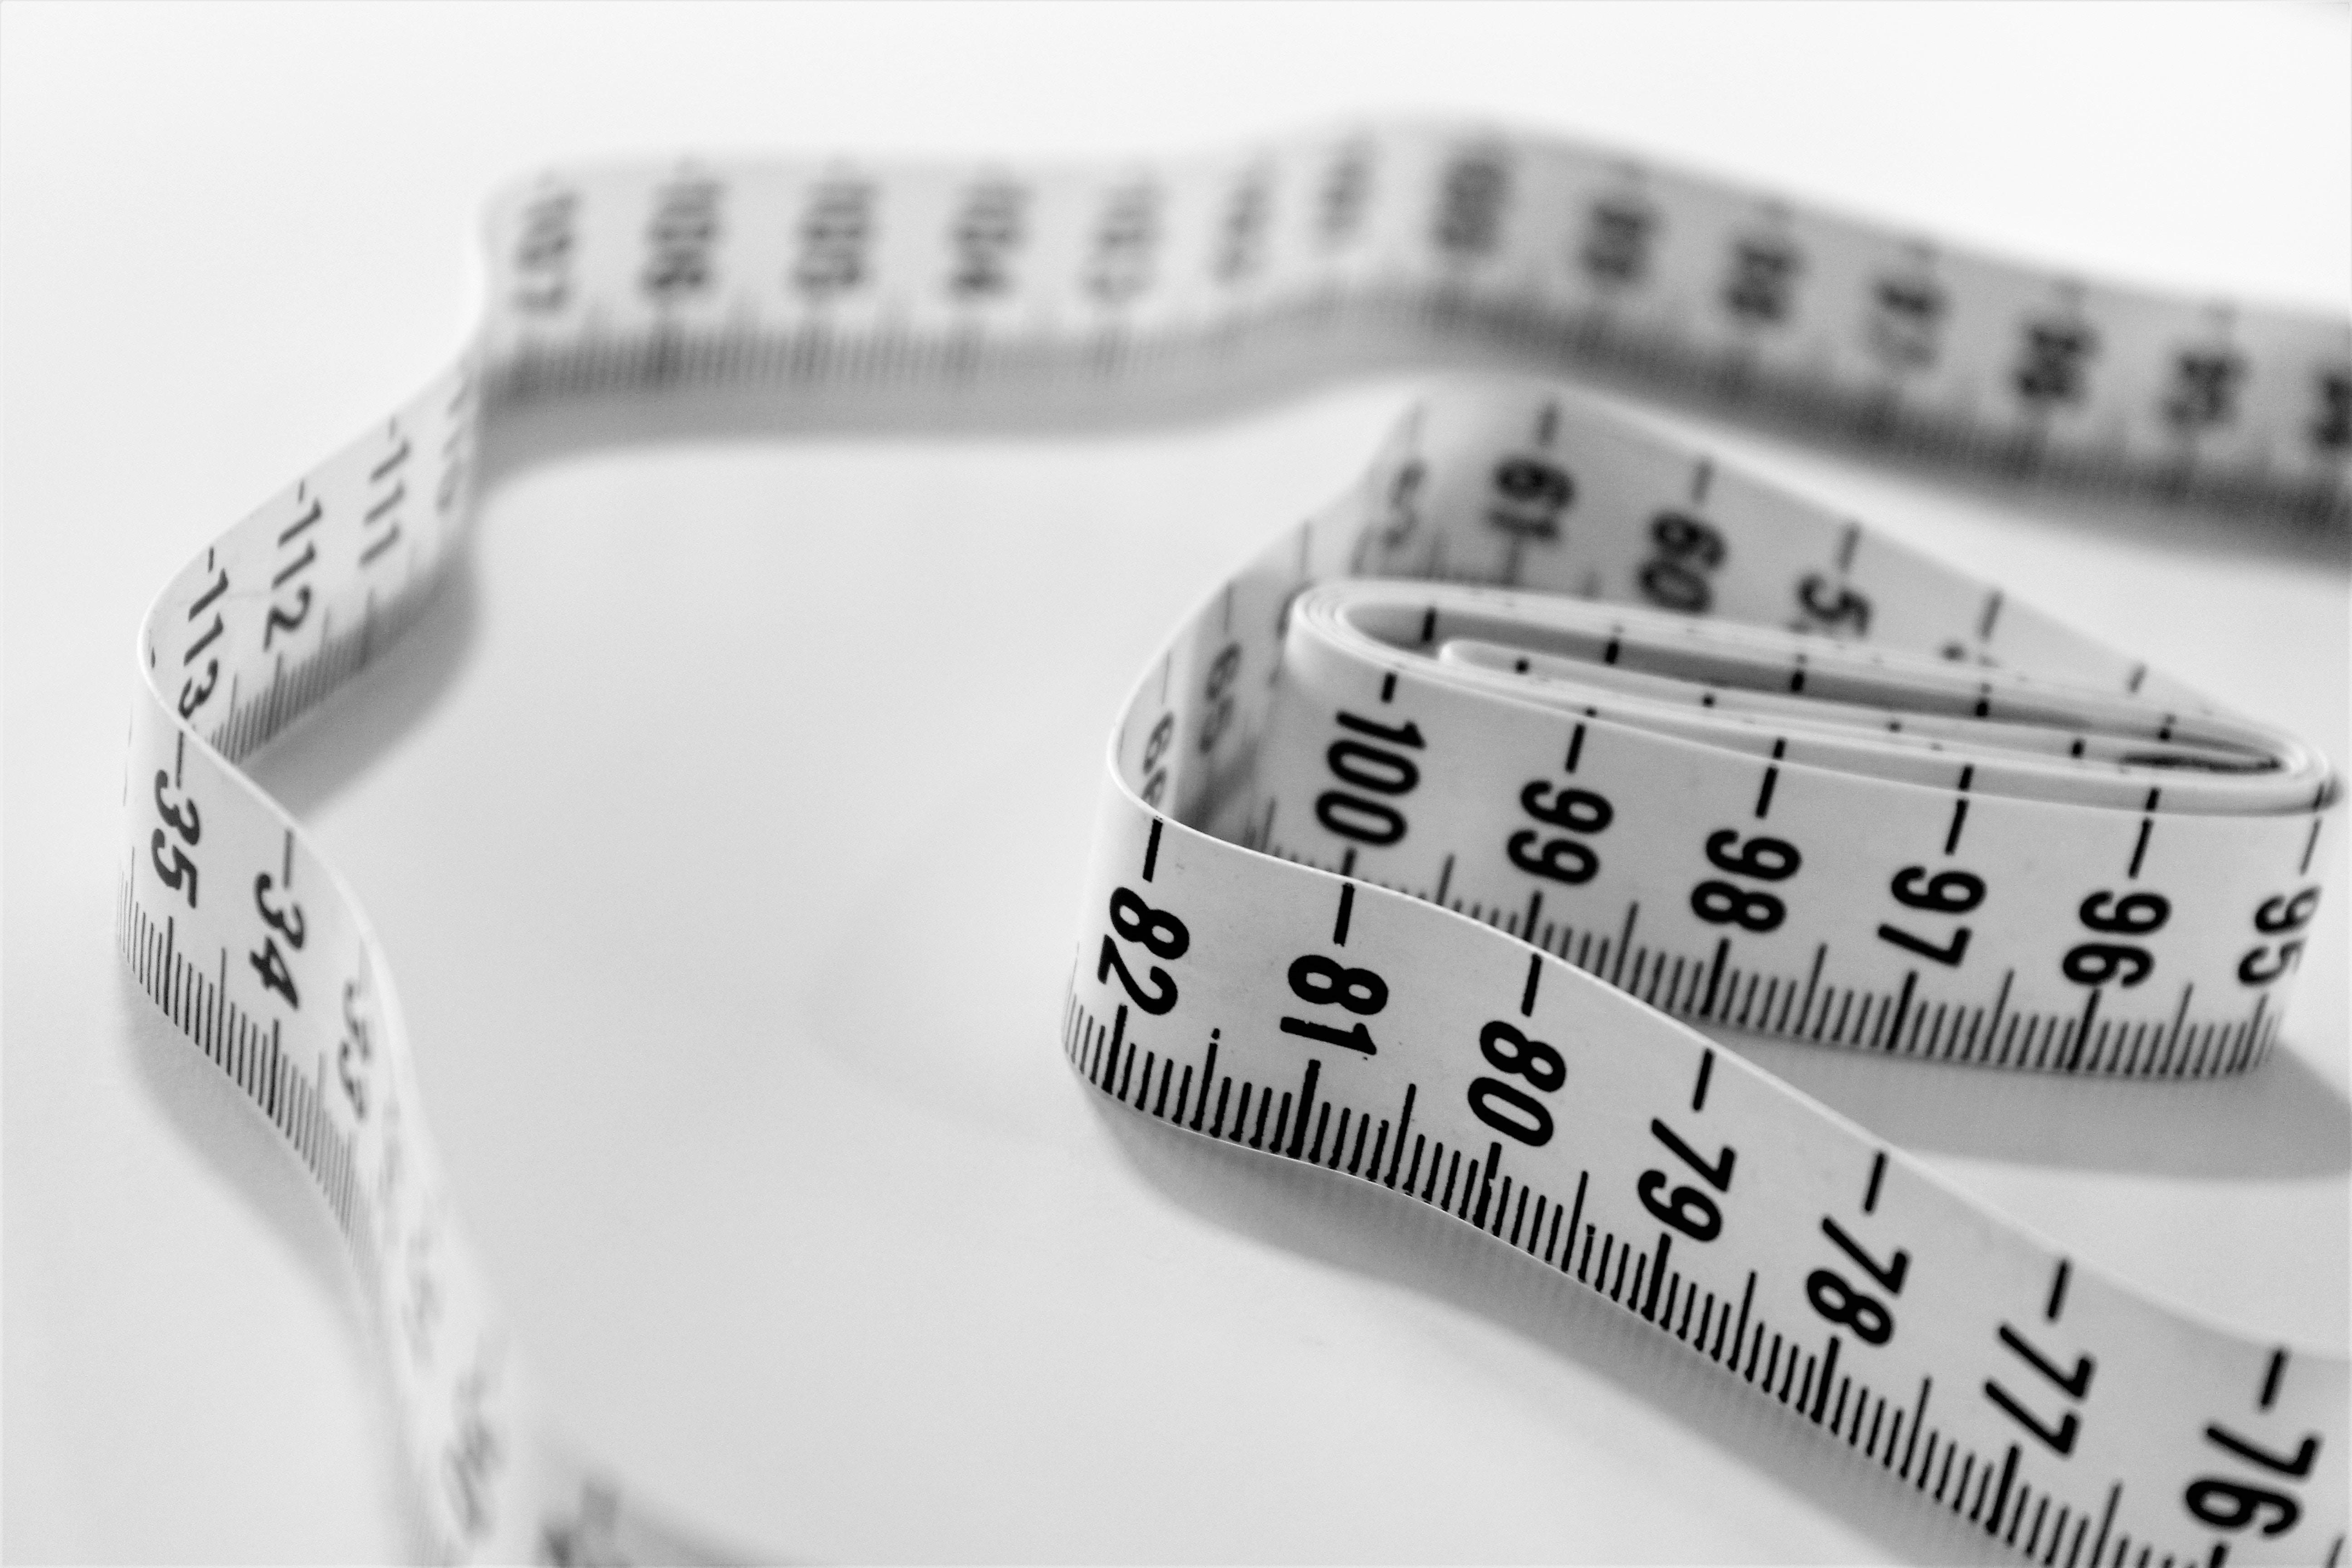 Keto kalkulátor | Ironmania - Start kg, Cél: Ironman - Ketogén étrenddel